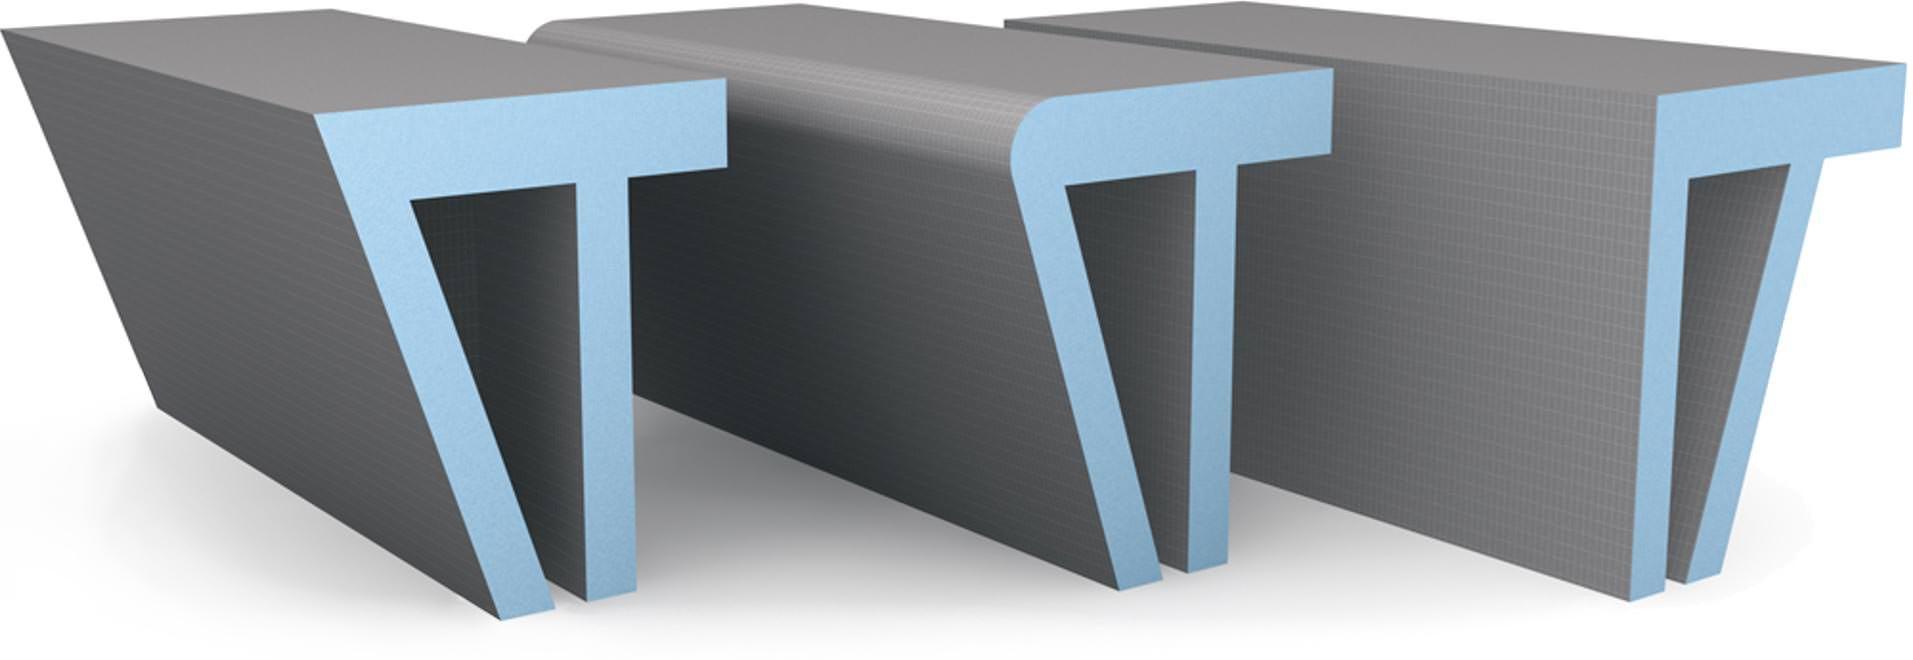 wedi platte dusche fkh. Black Bedroom Furniture Sets. Home Design Ideas